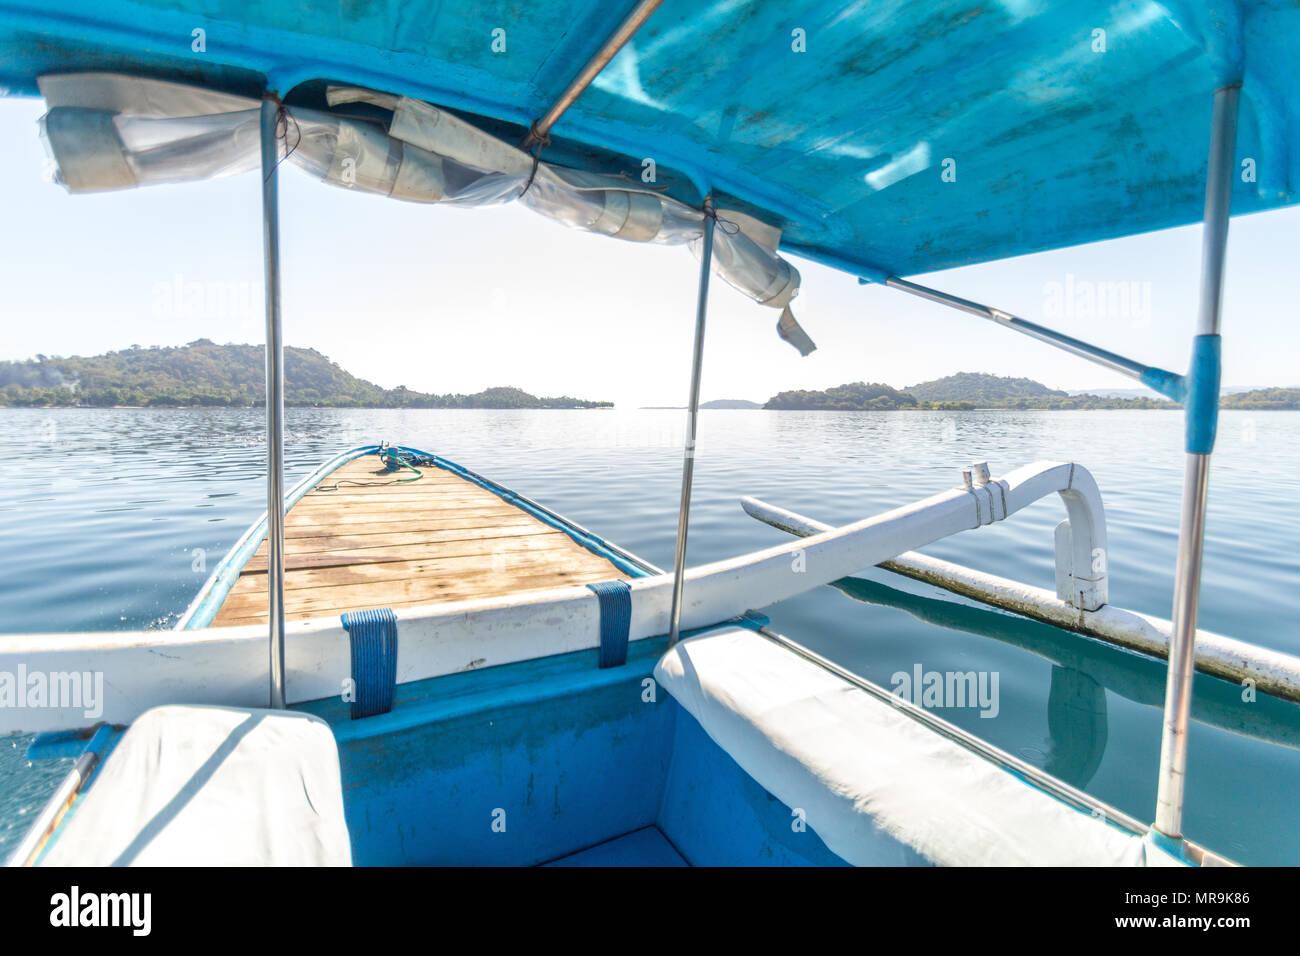 Viaje en barco, la isla de Gili, Indonesia Imagen De Stock